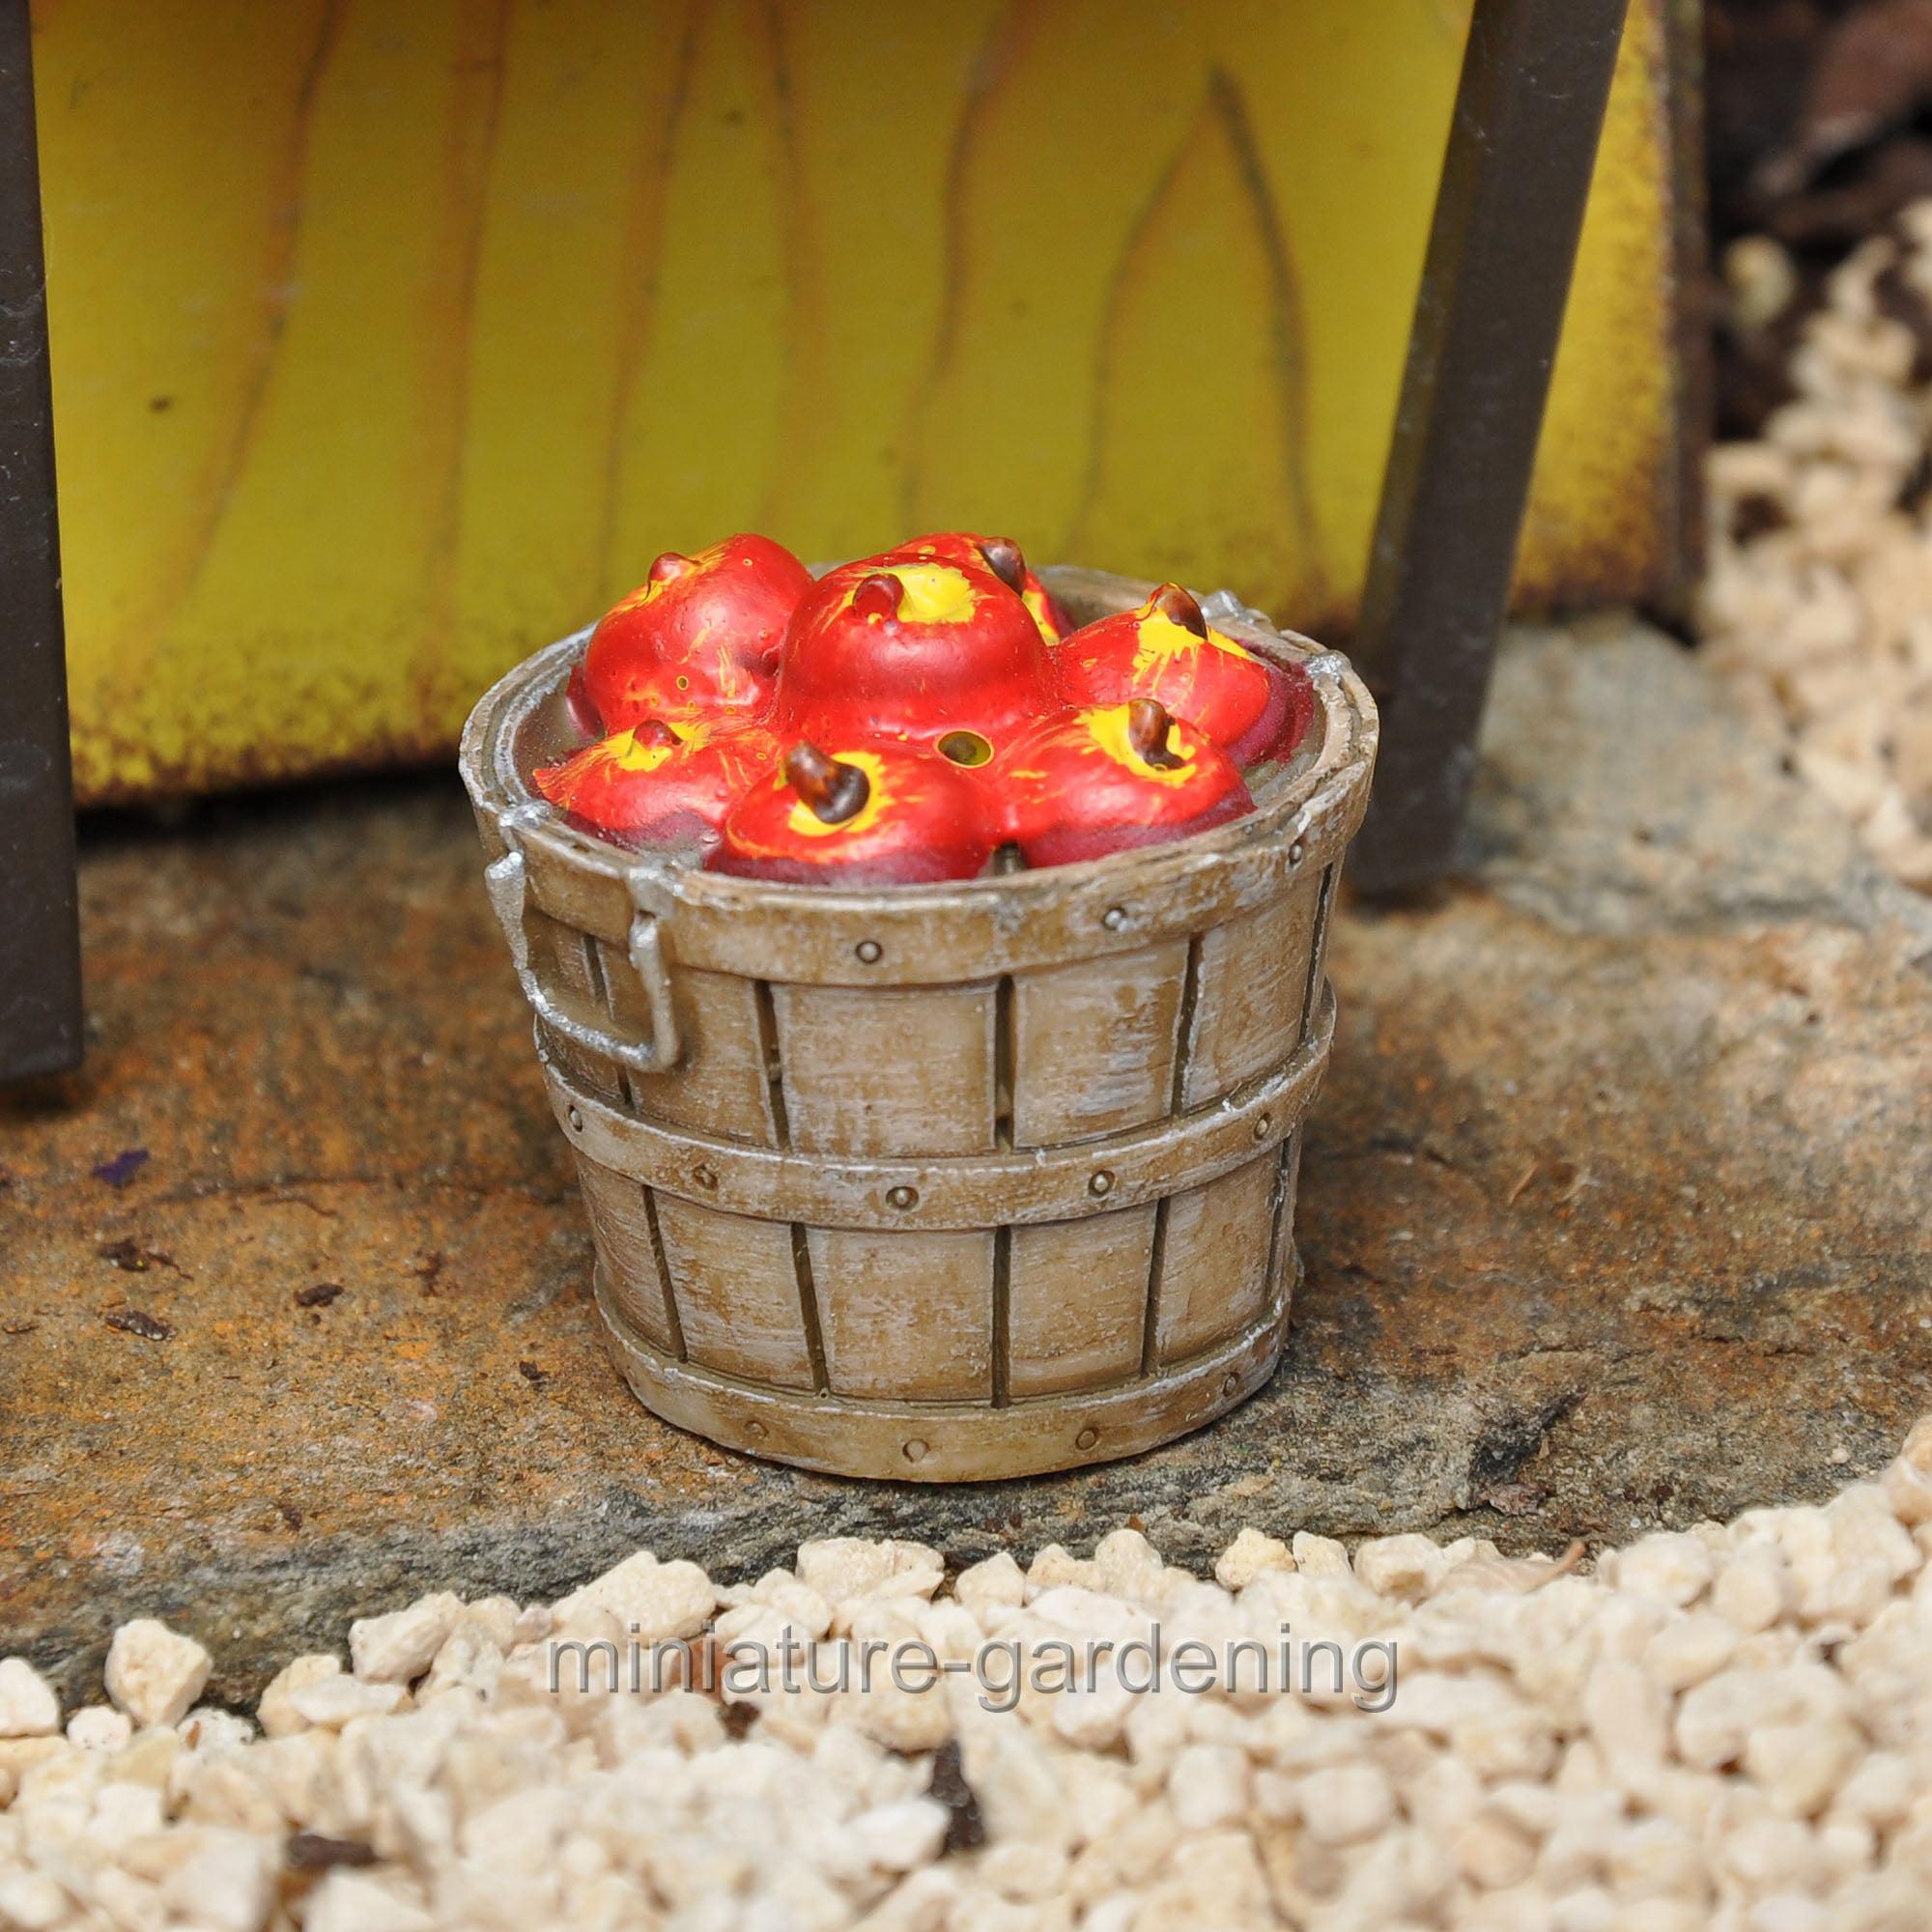 Wholesale Fairy Gardens Bushel of Apples for Miniature Garden, Fairy ...